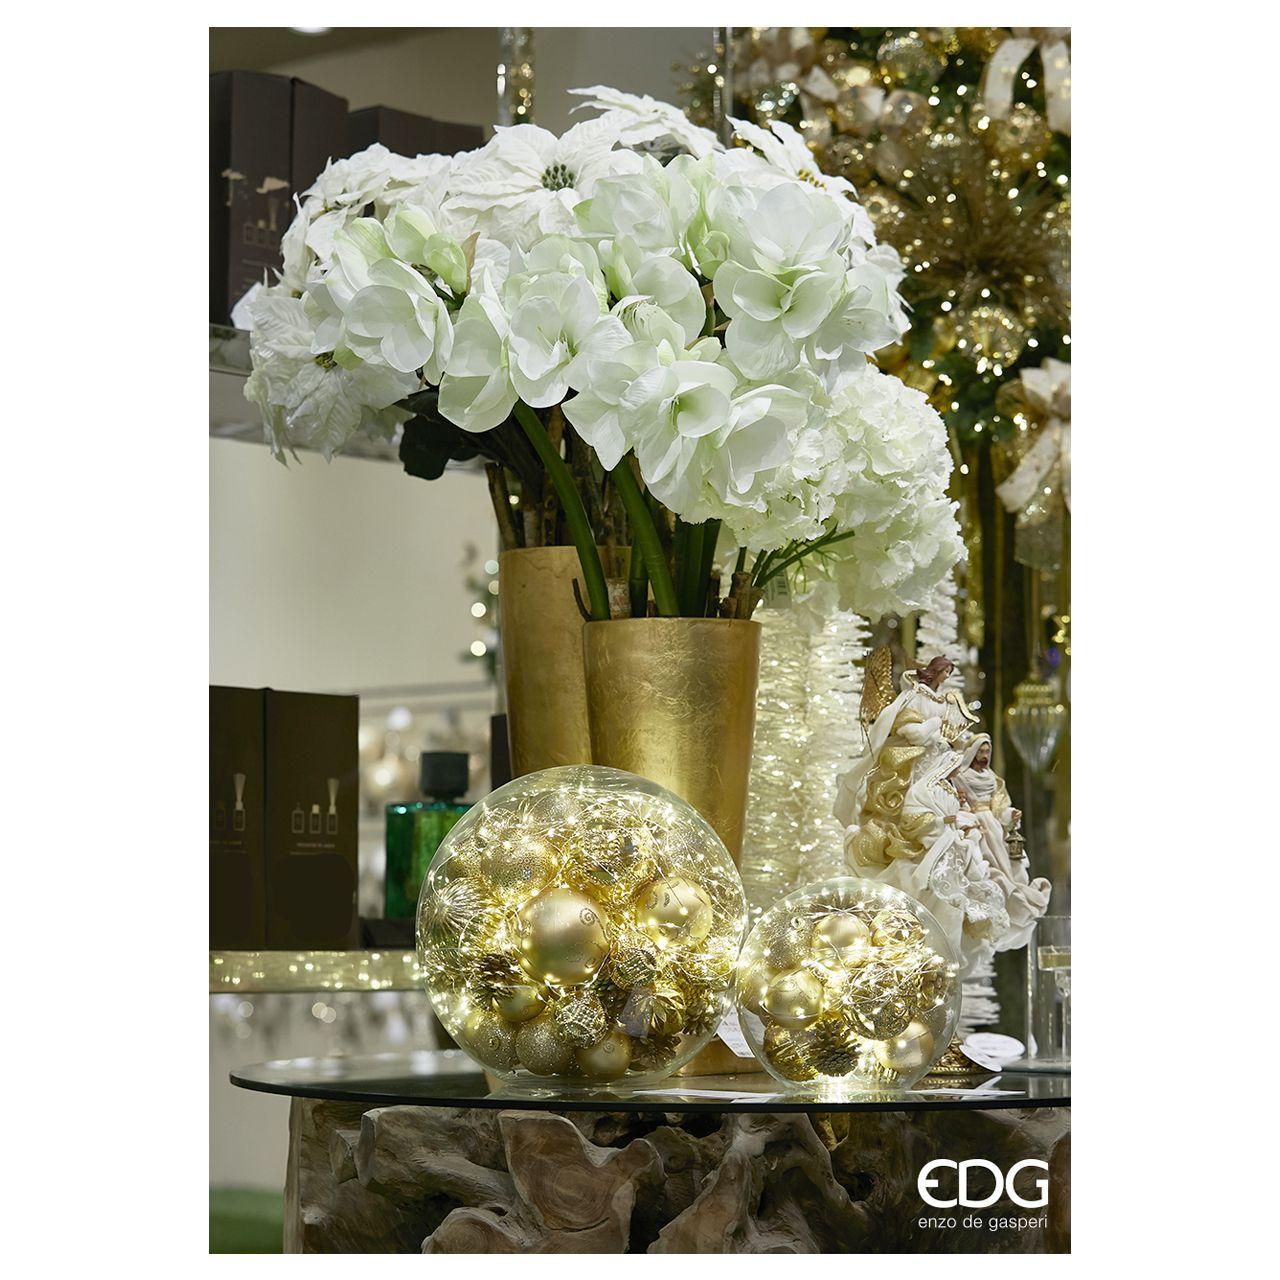 EDG Enzo De Gasperi   Home Decoration   Artificial Flowers Homi Fiera  Milano 2017 #makeyouredgxmas